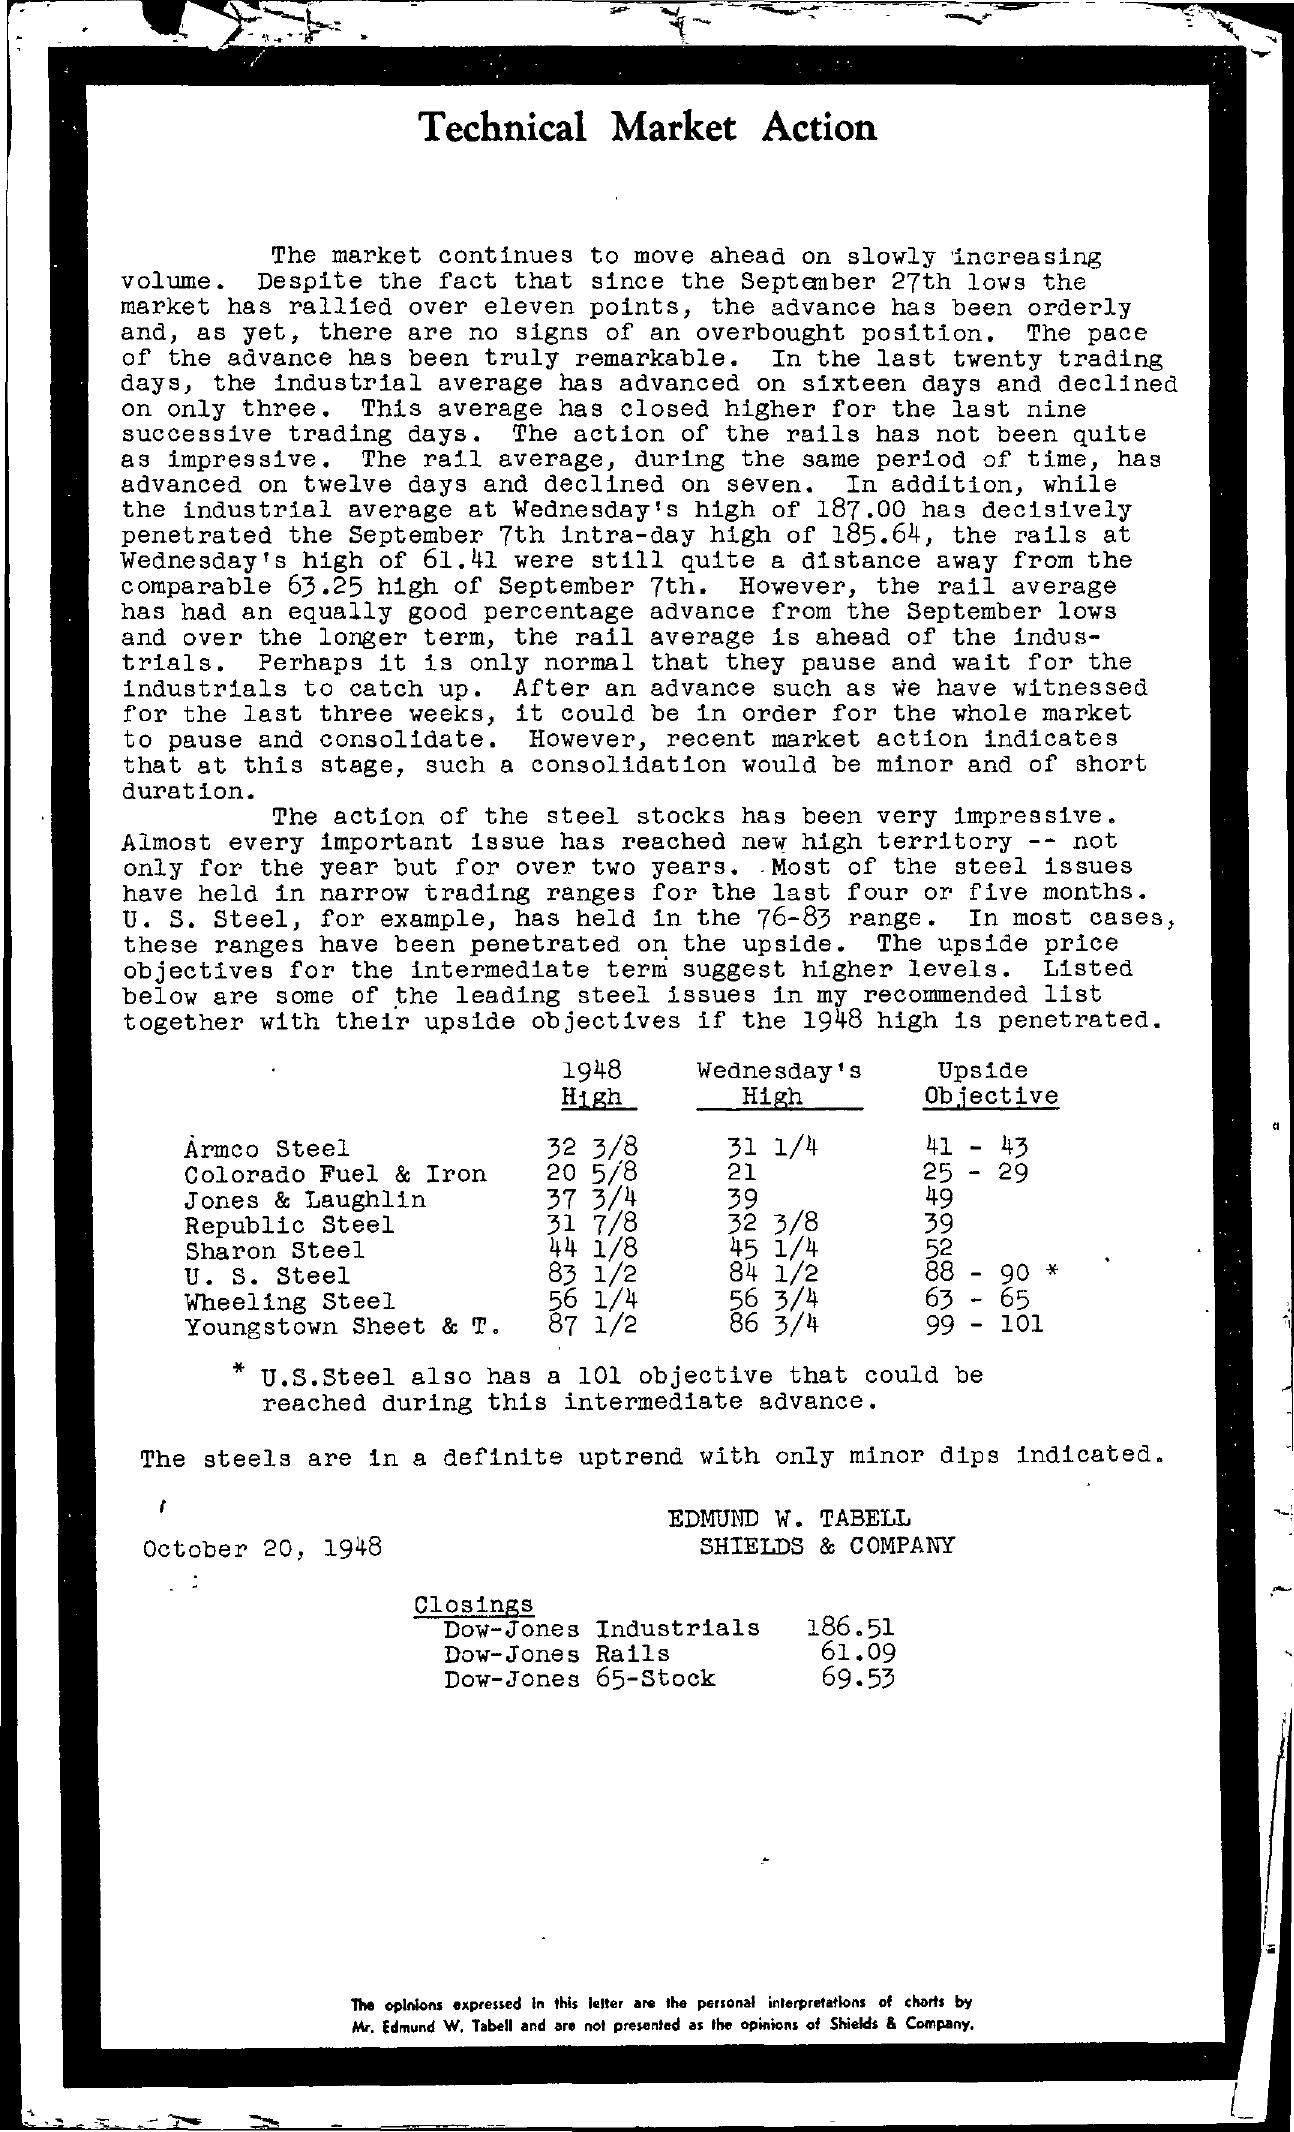 Tabell's Market Letter - October 20, 1948